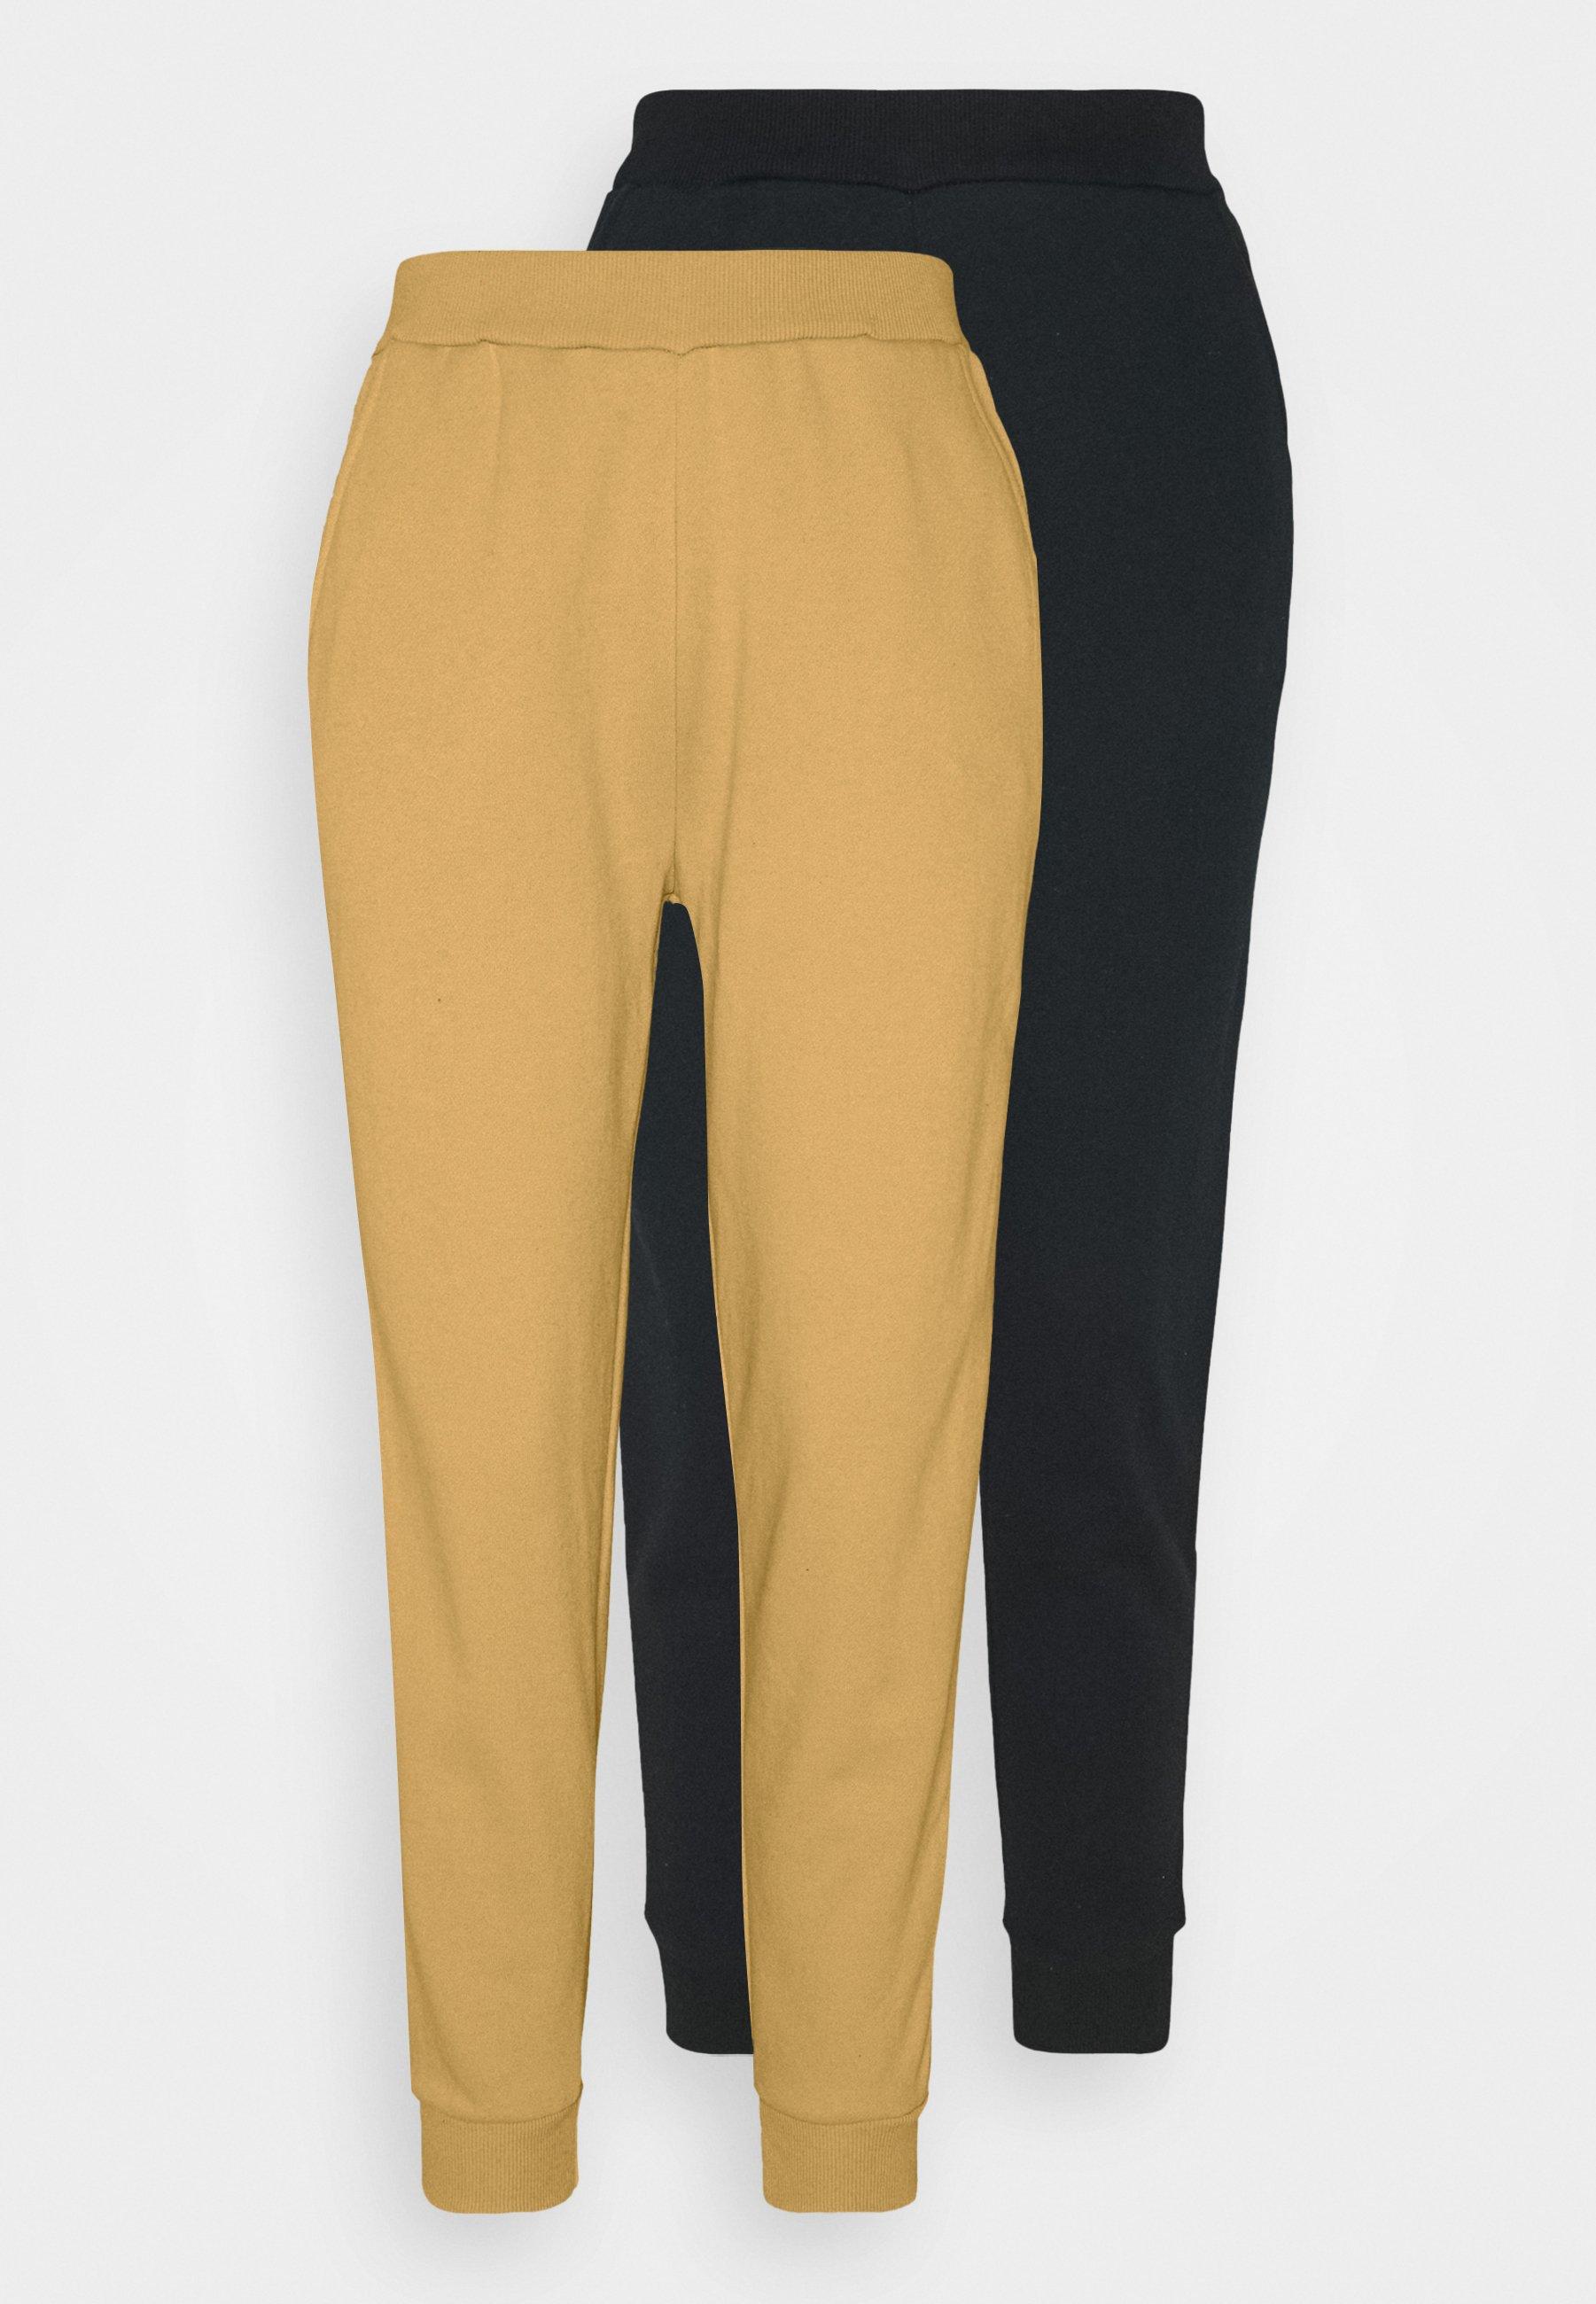 Women 2er PACK - Basic regular fit joggers - Tracksuit bottoms